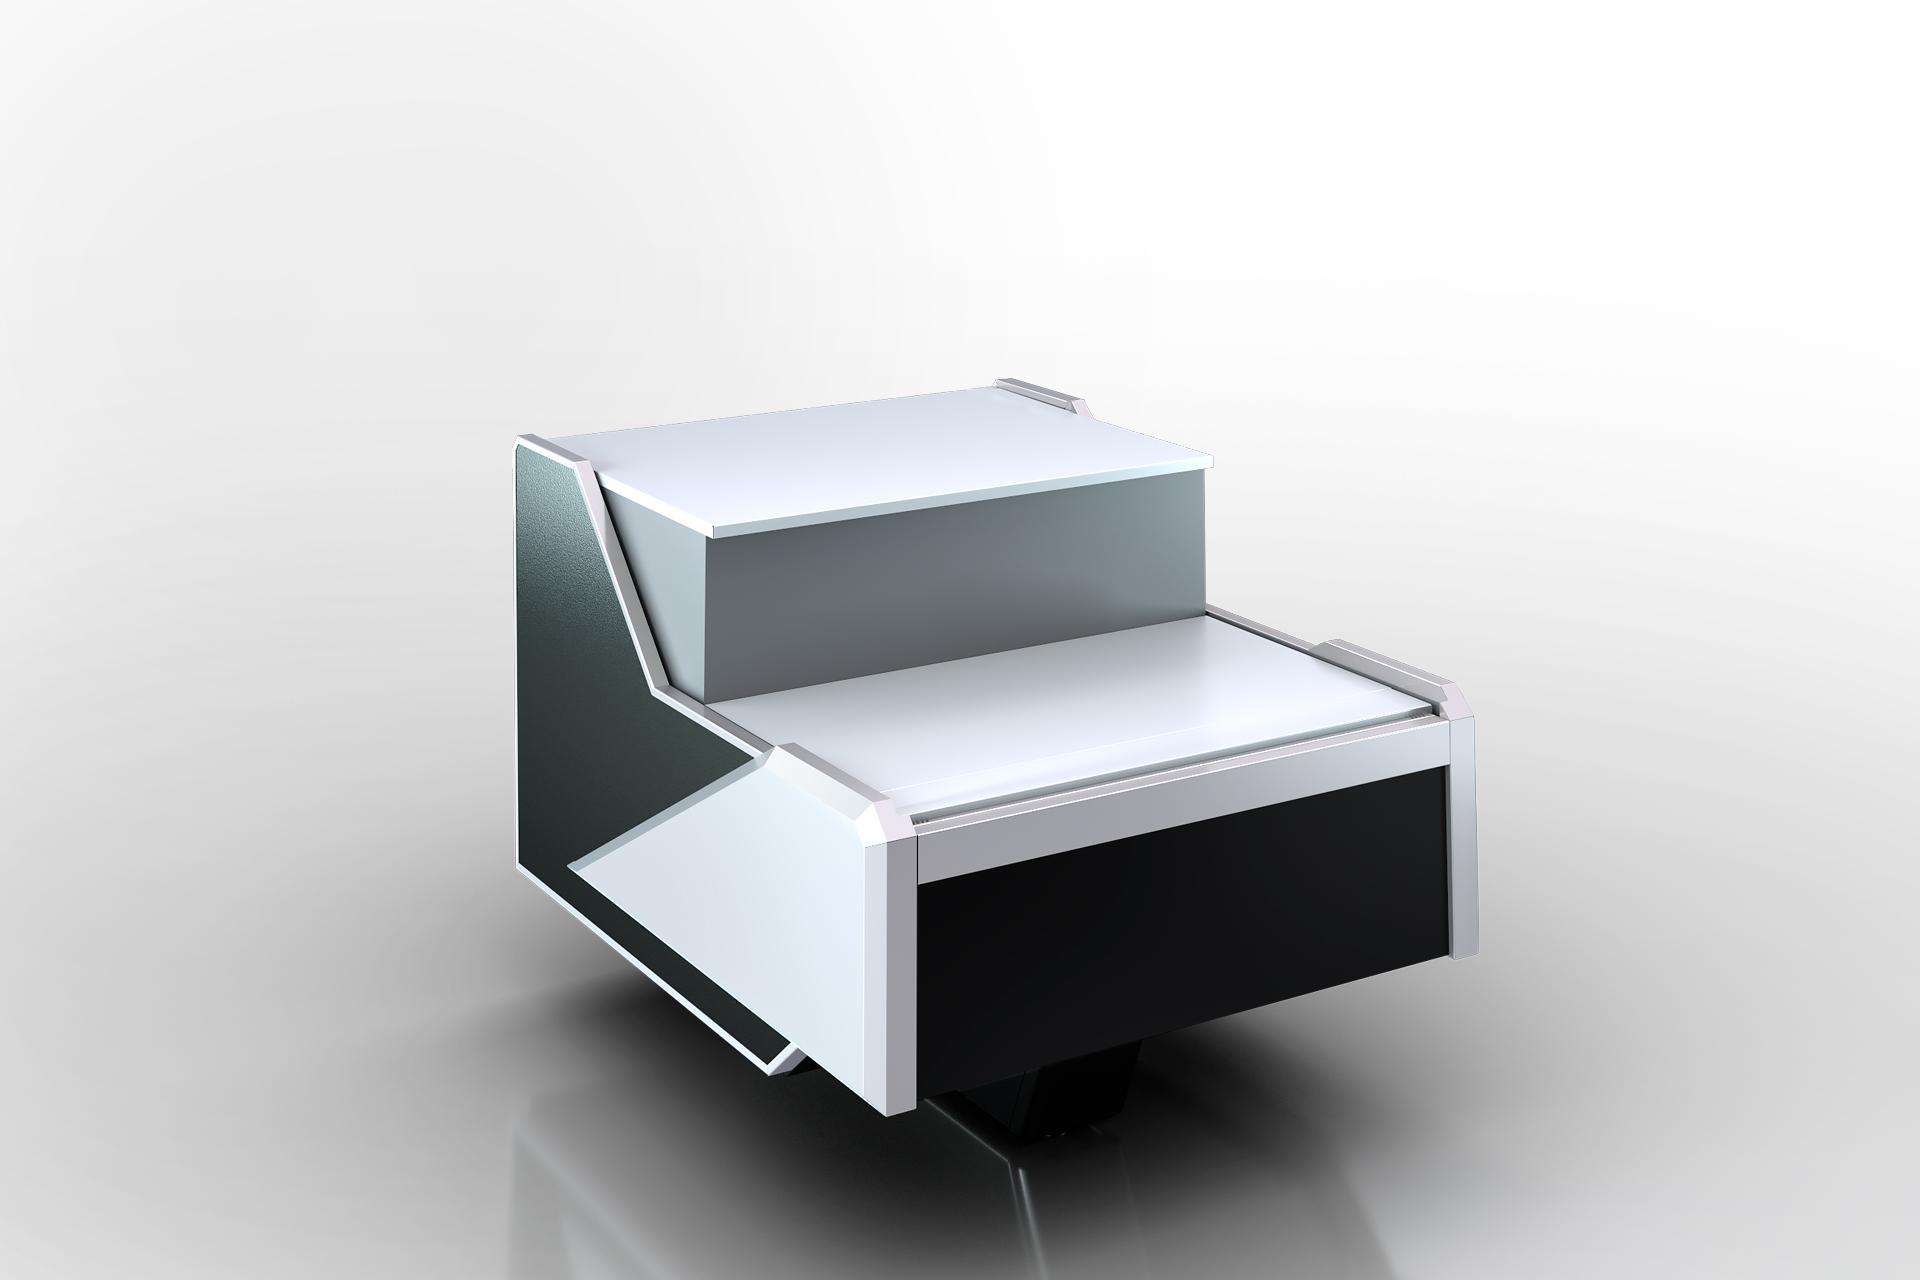 Вітрина Missouri enigma NC 122 cash desk 084